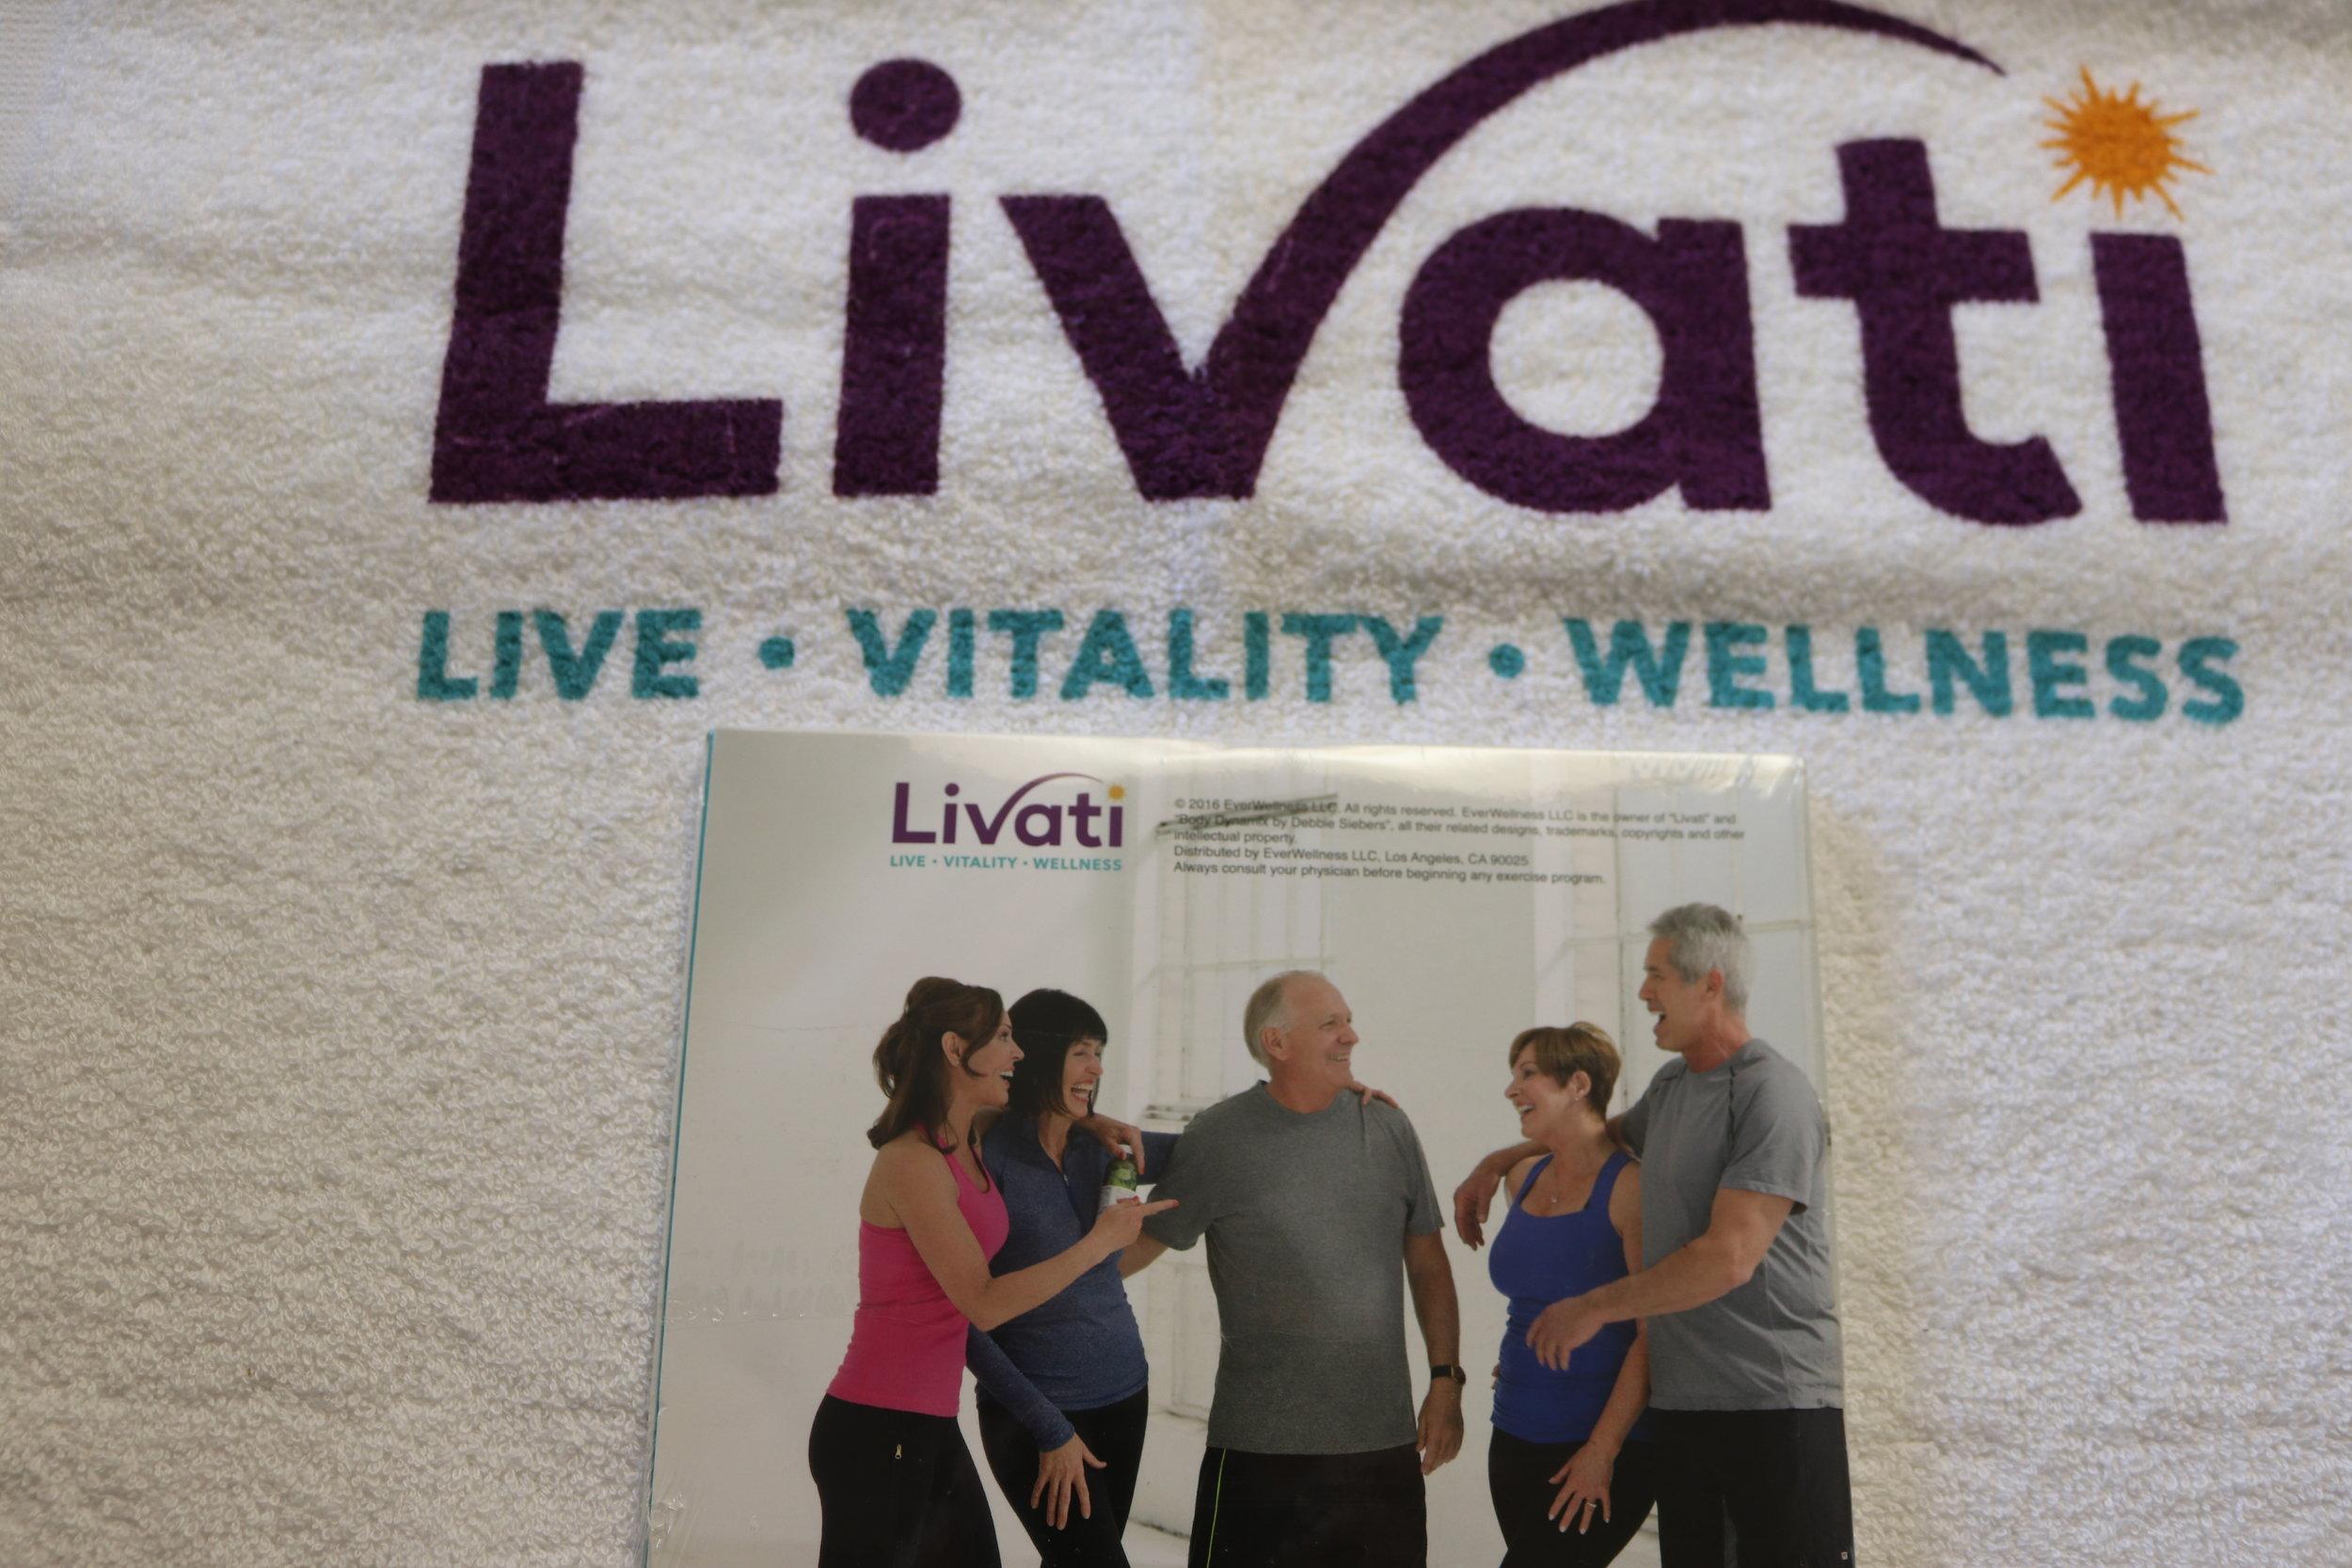 Livati Body Dynamix Low impact workouts - whatthegirlssay.com